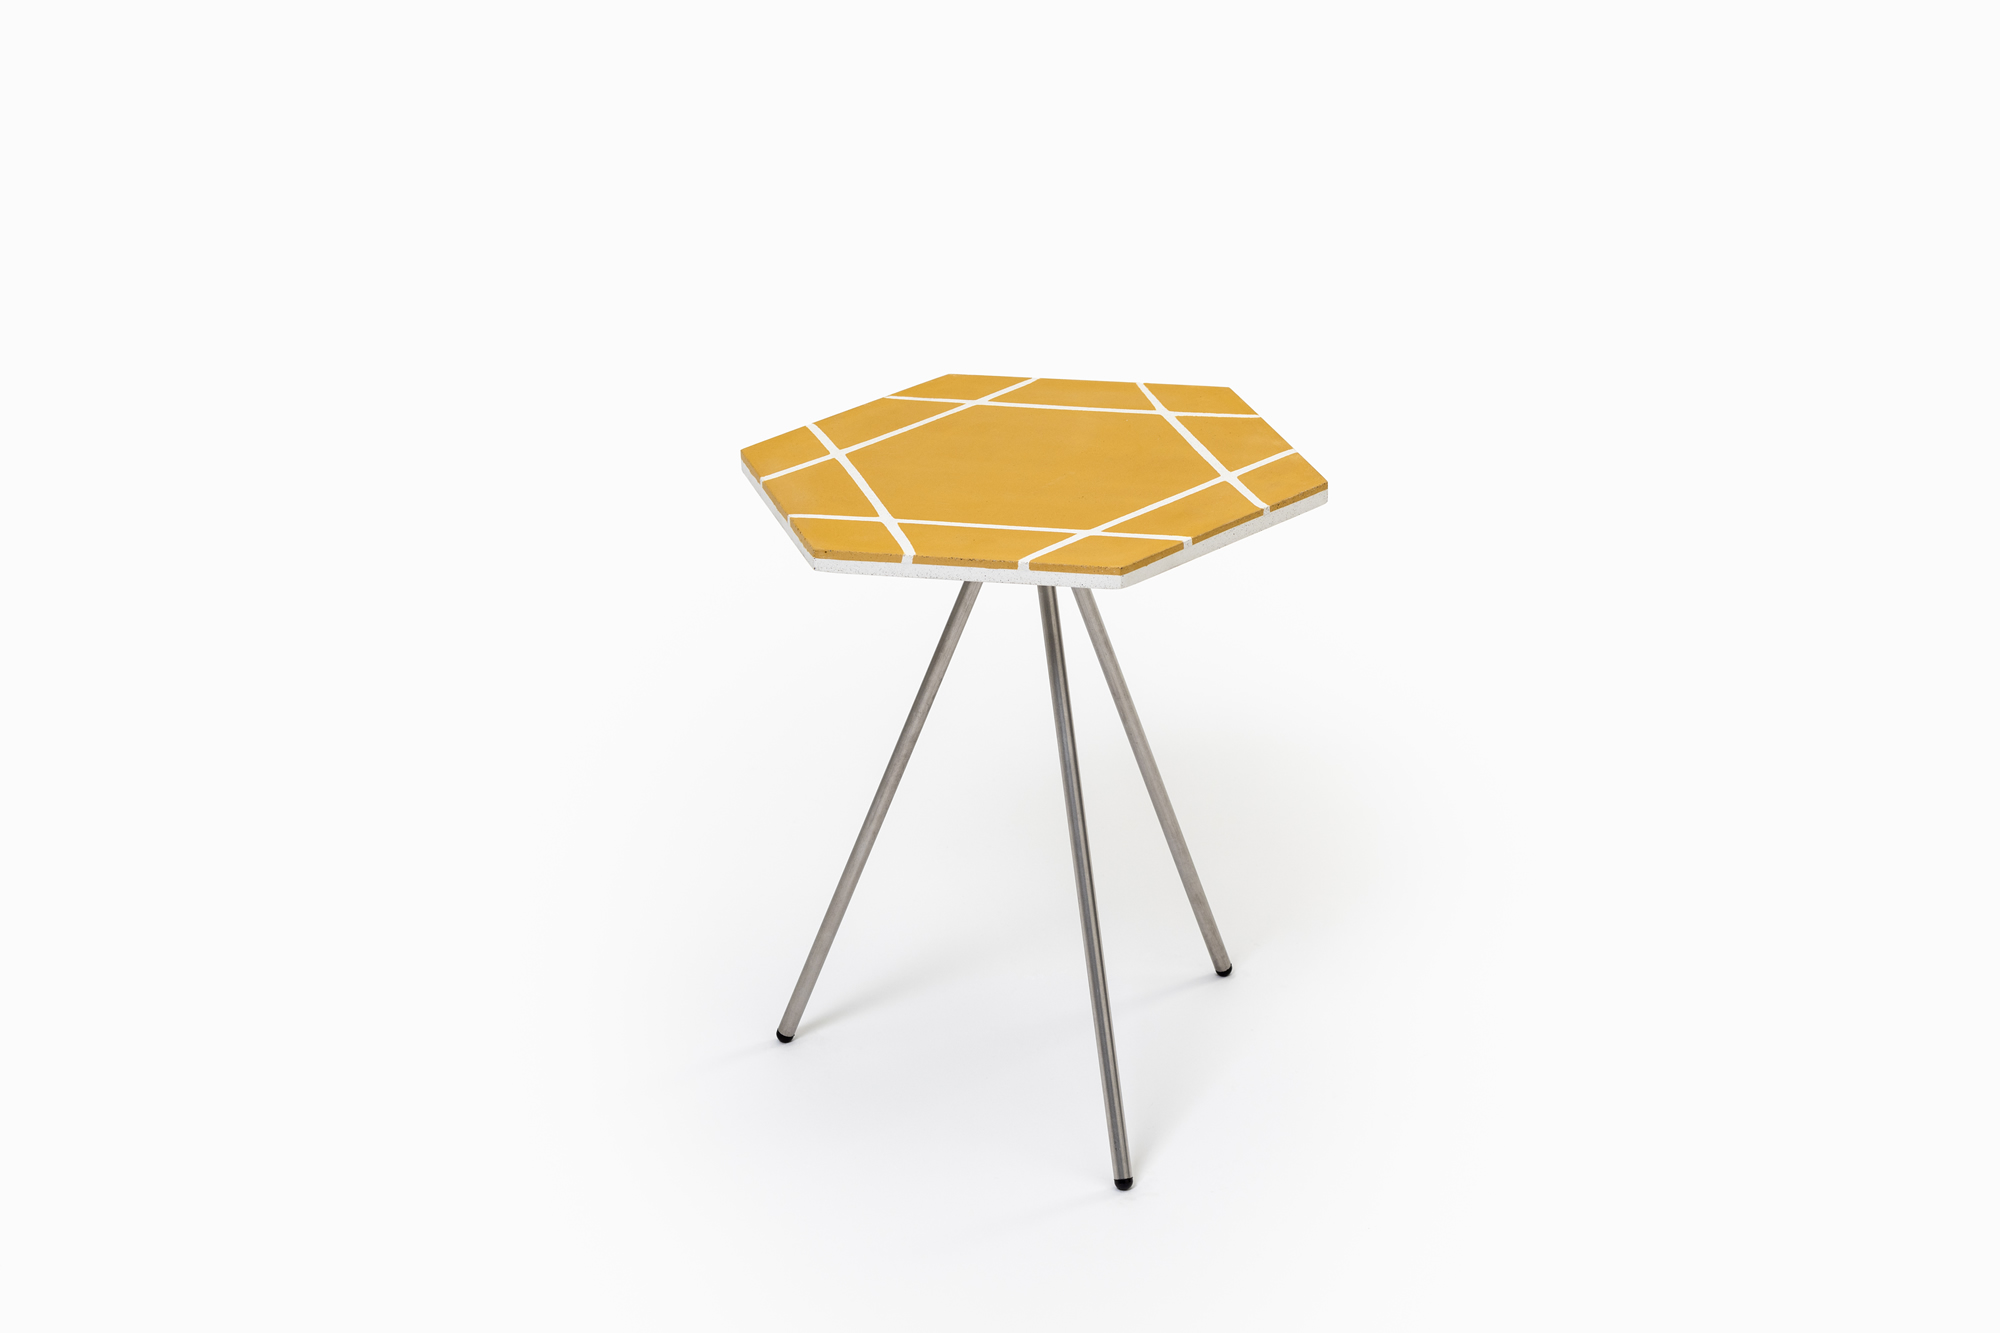 riad table by alvaro catalan de ocon u francesco faccin